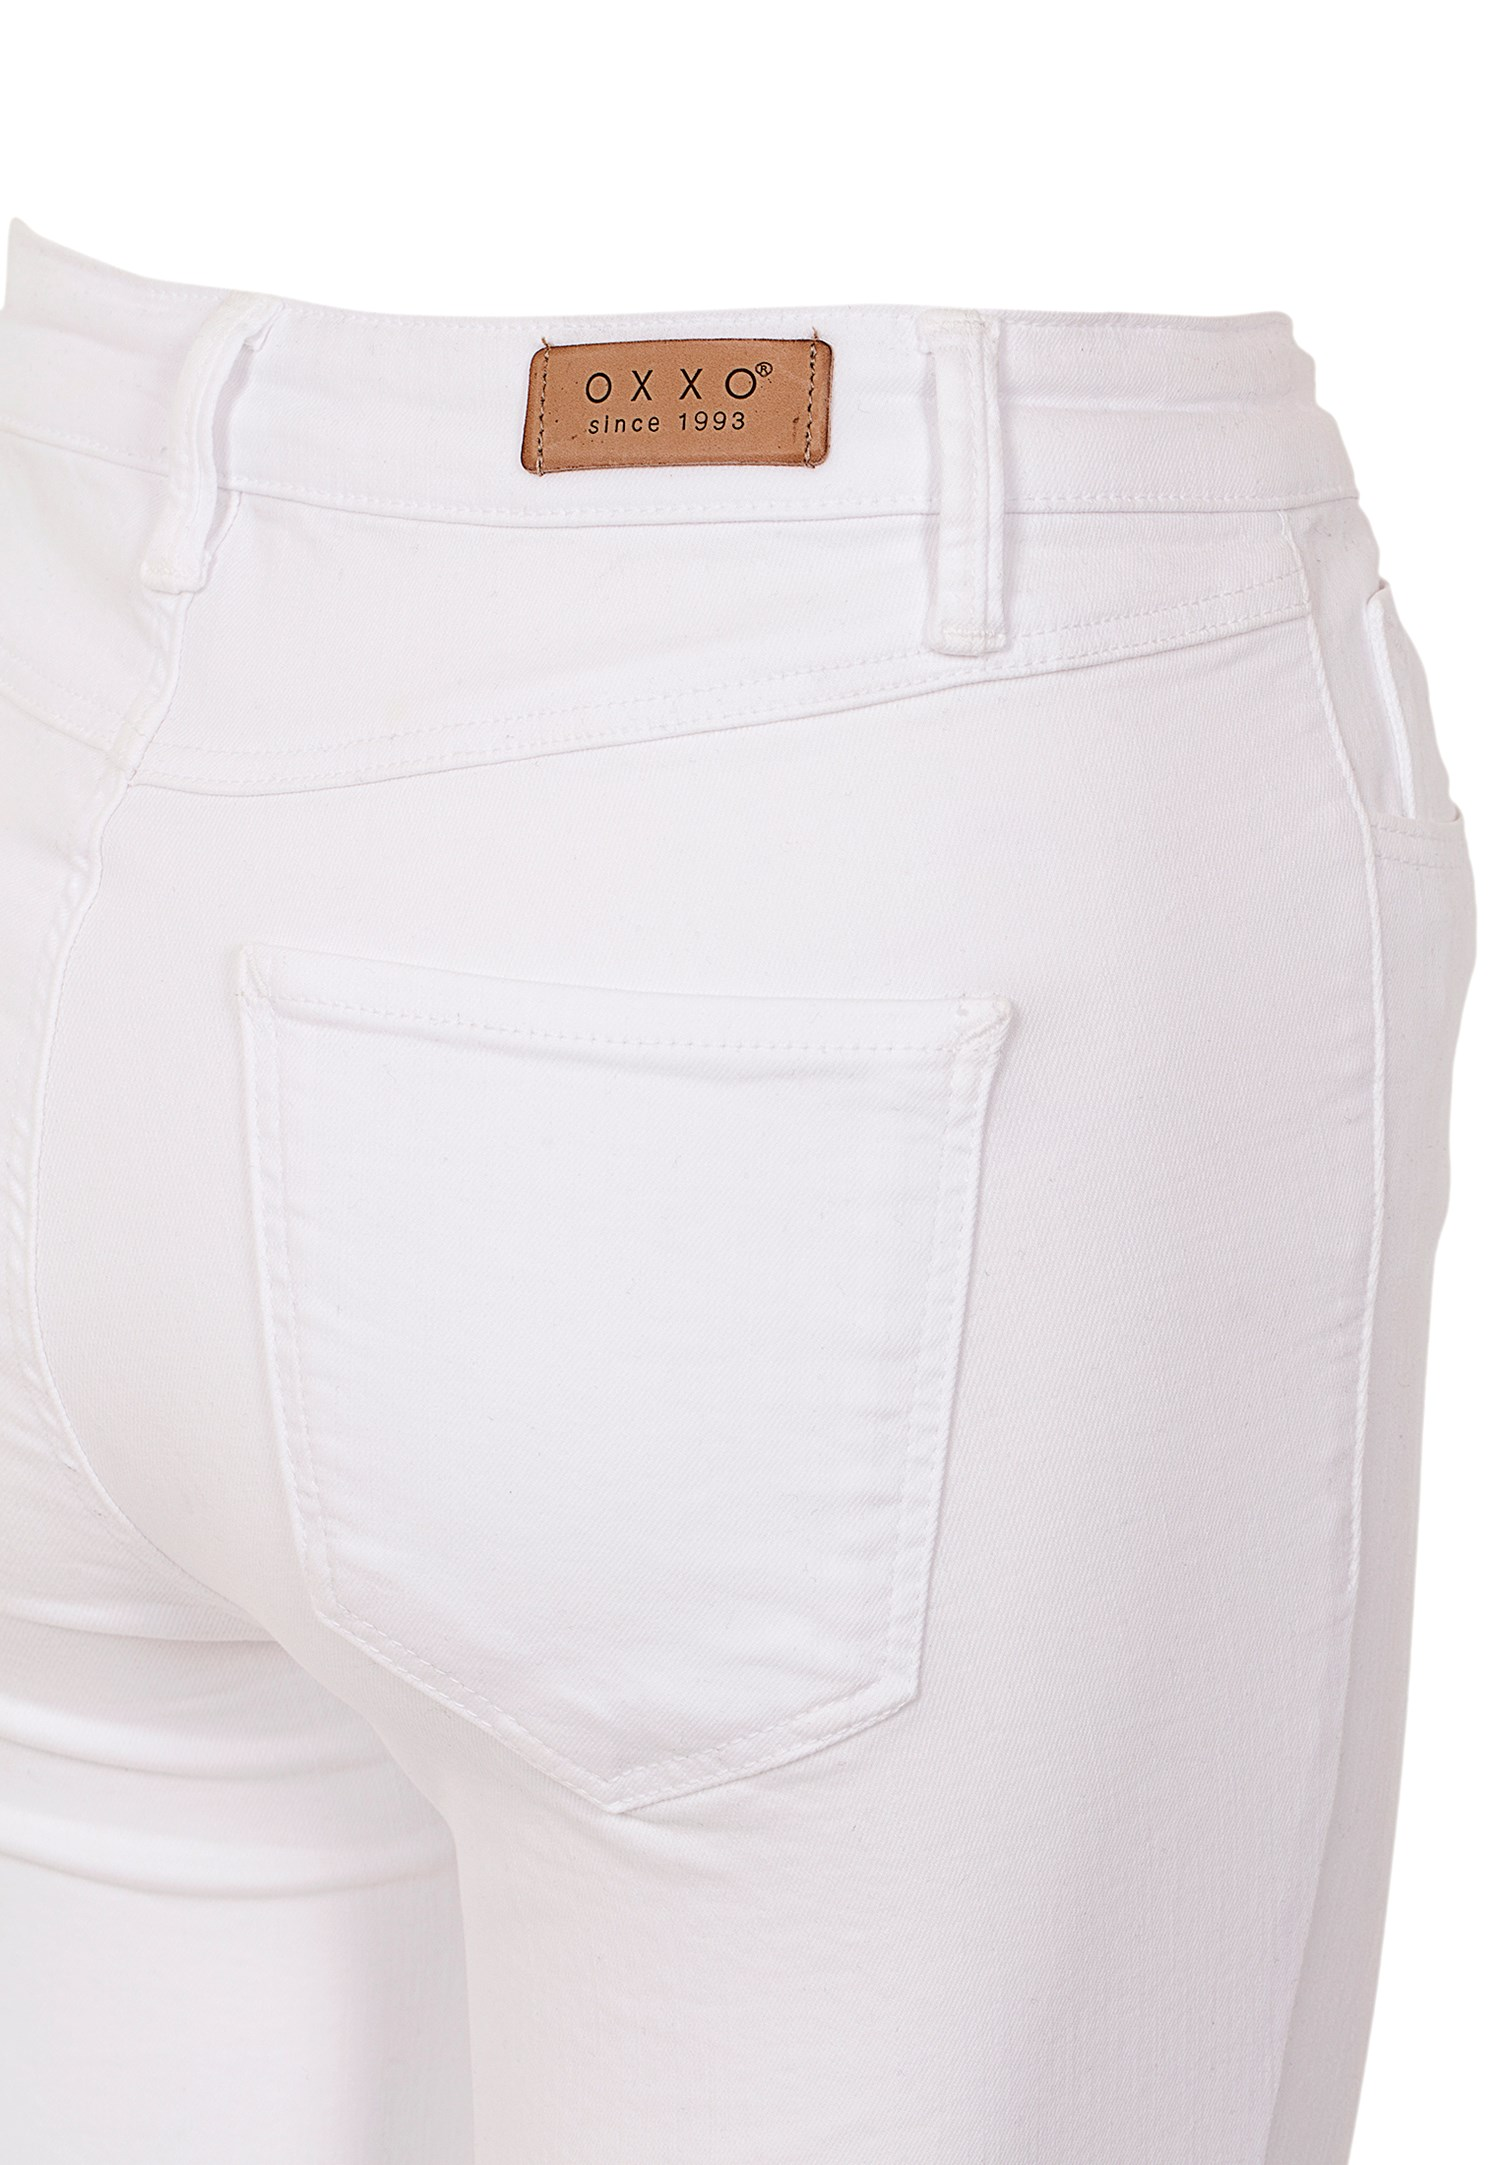 Bayan Beyaz Yüksek Bel Pantolon